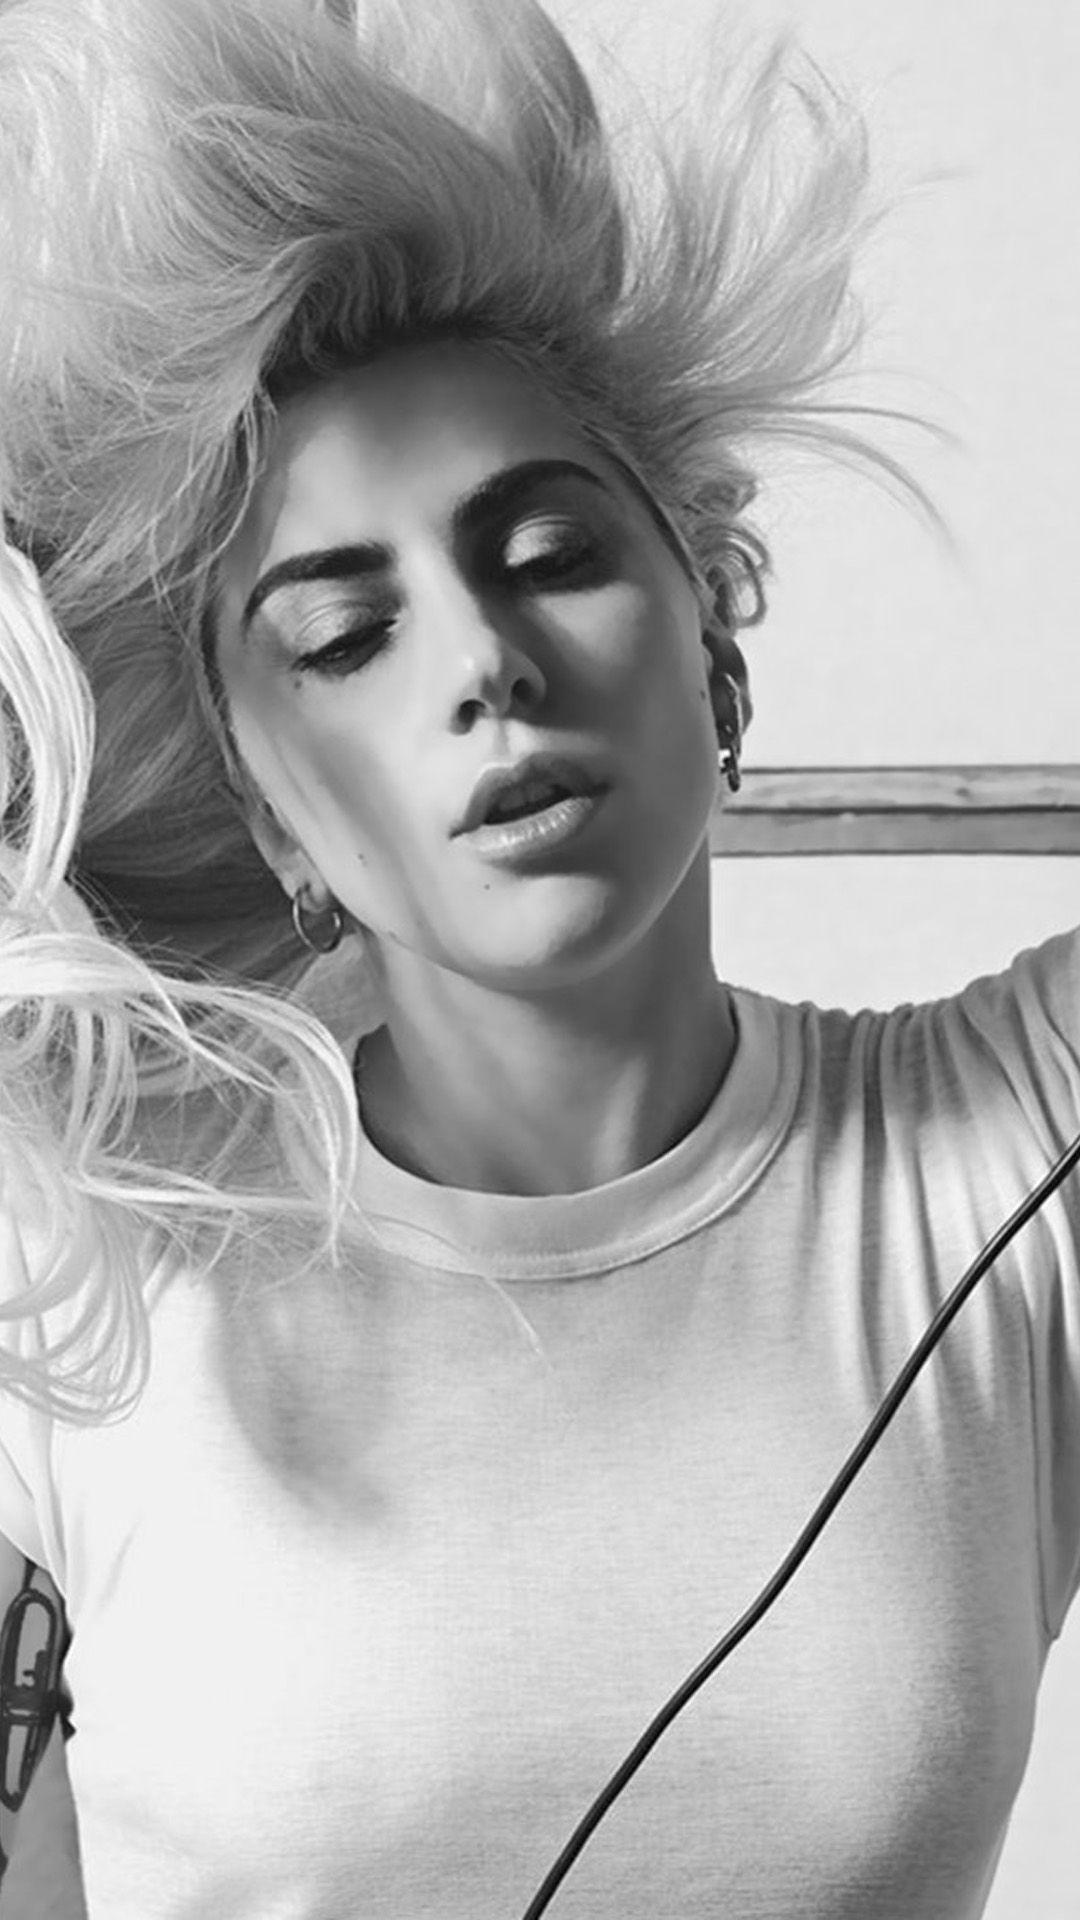 Lady Gaga 2018 4k Ultra Hd Mobile Wallpaper Lady Gaga Pictures Lady Gaga Photos Lady Gaga